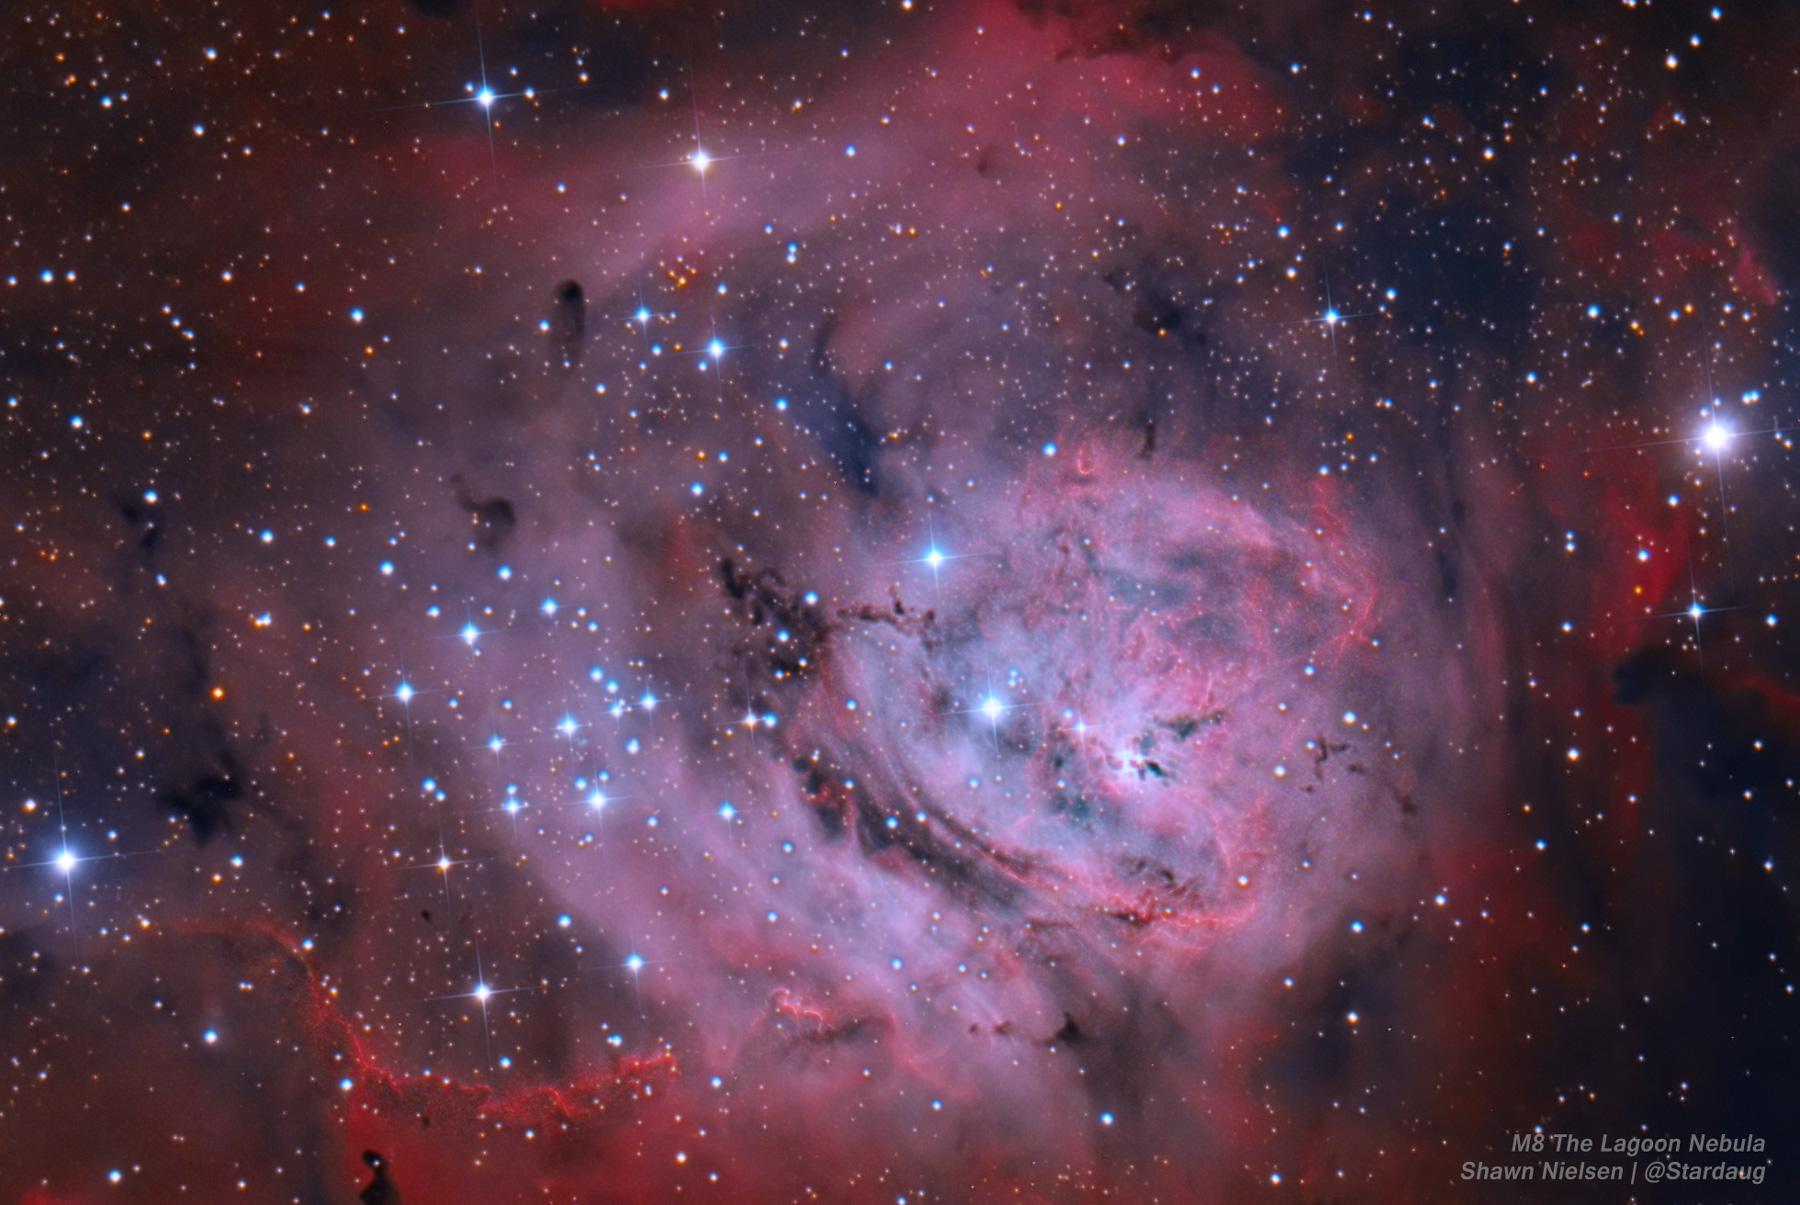 The Lagoon Nebula M8 reprocessed